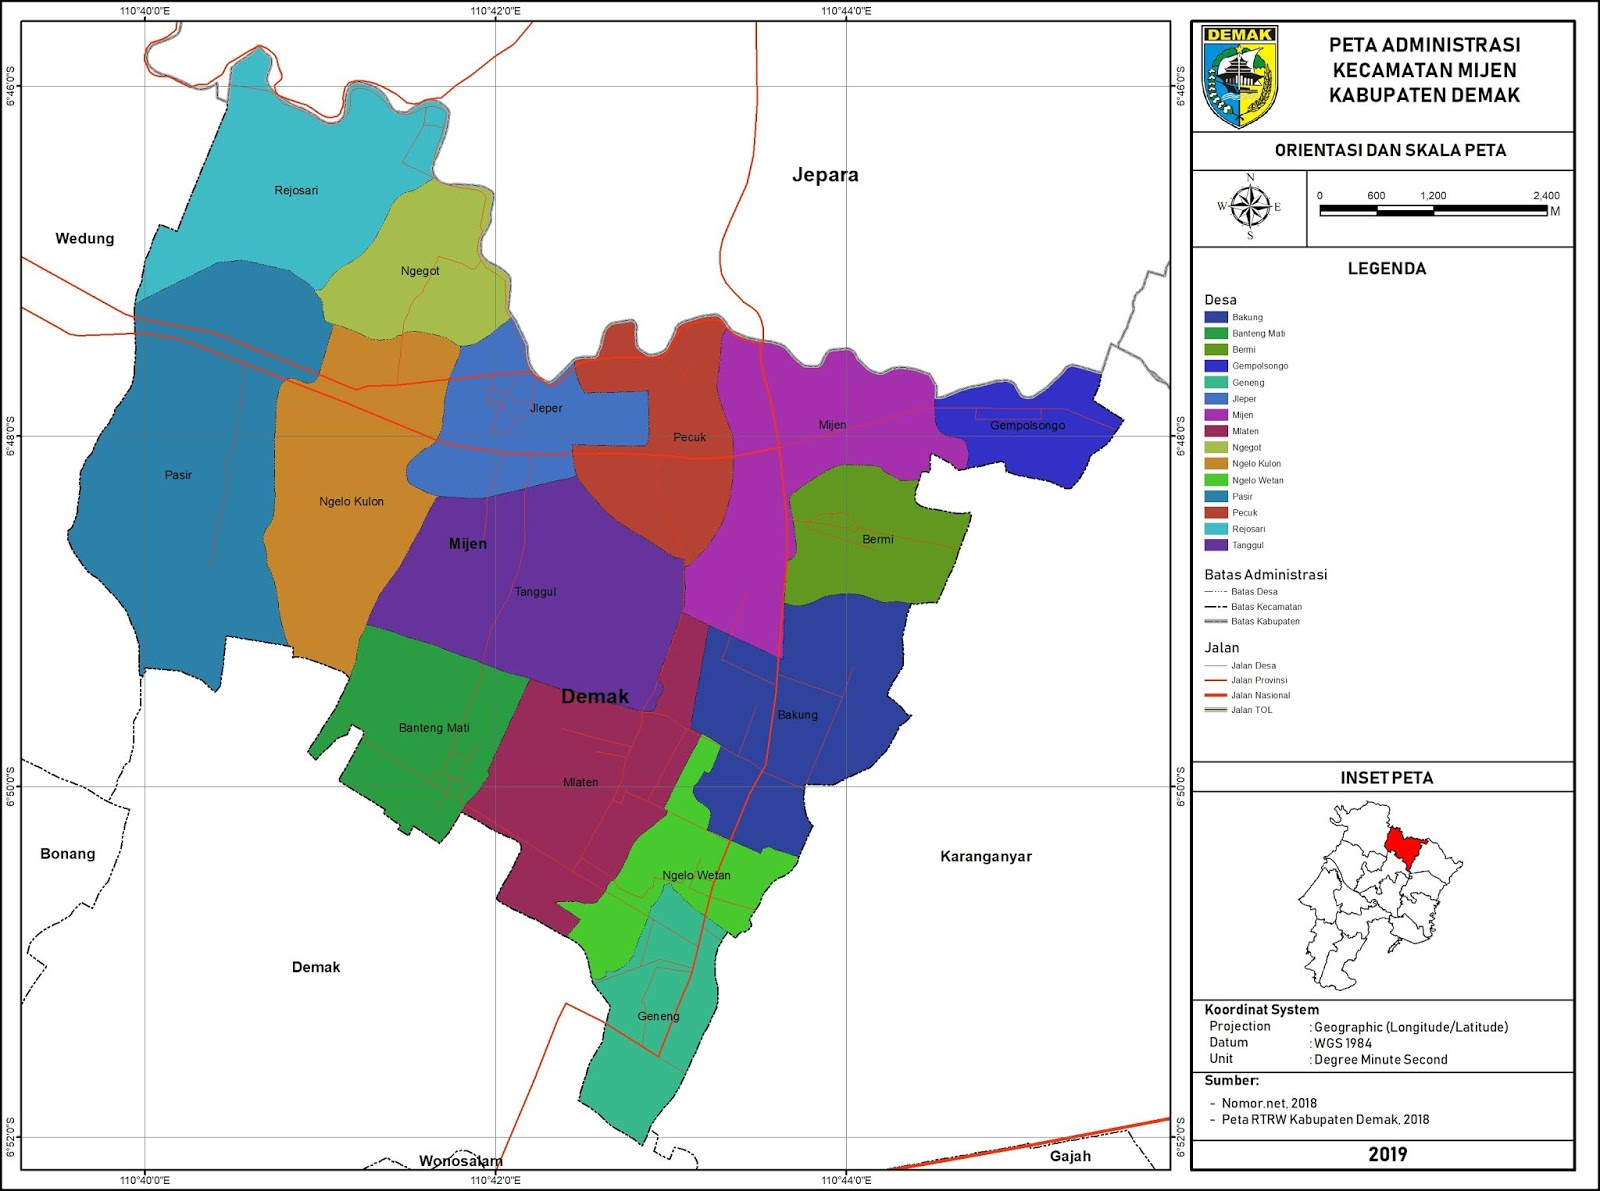 Peta Administrasi Kecamatan Mijen, Kabupaten Demak ...